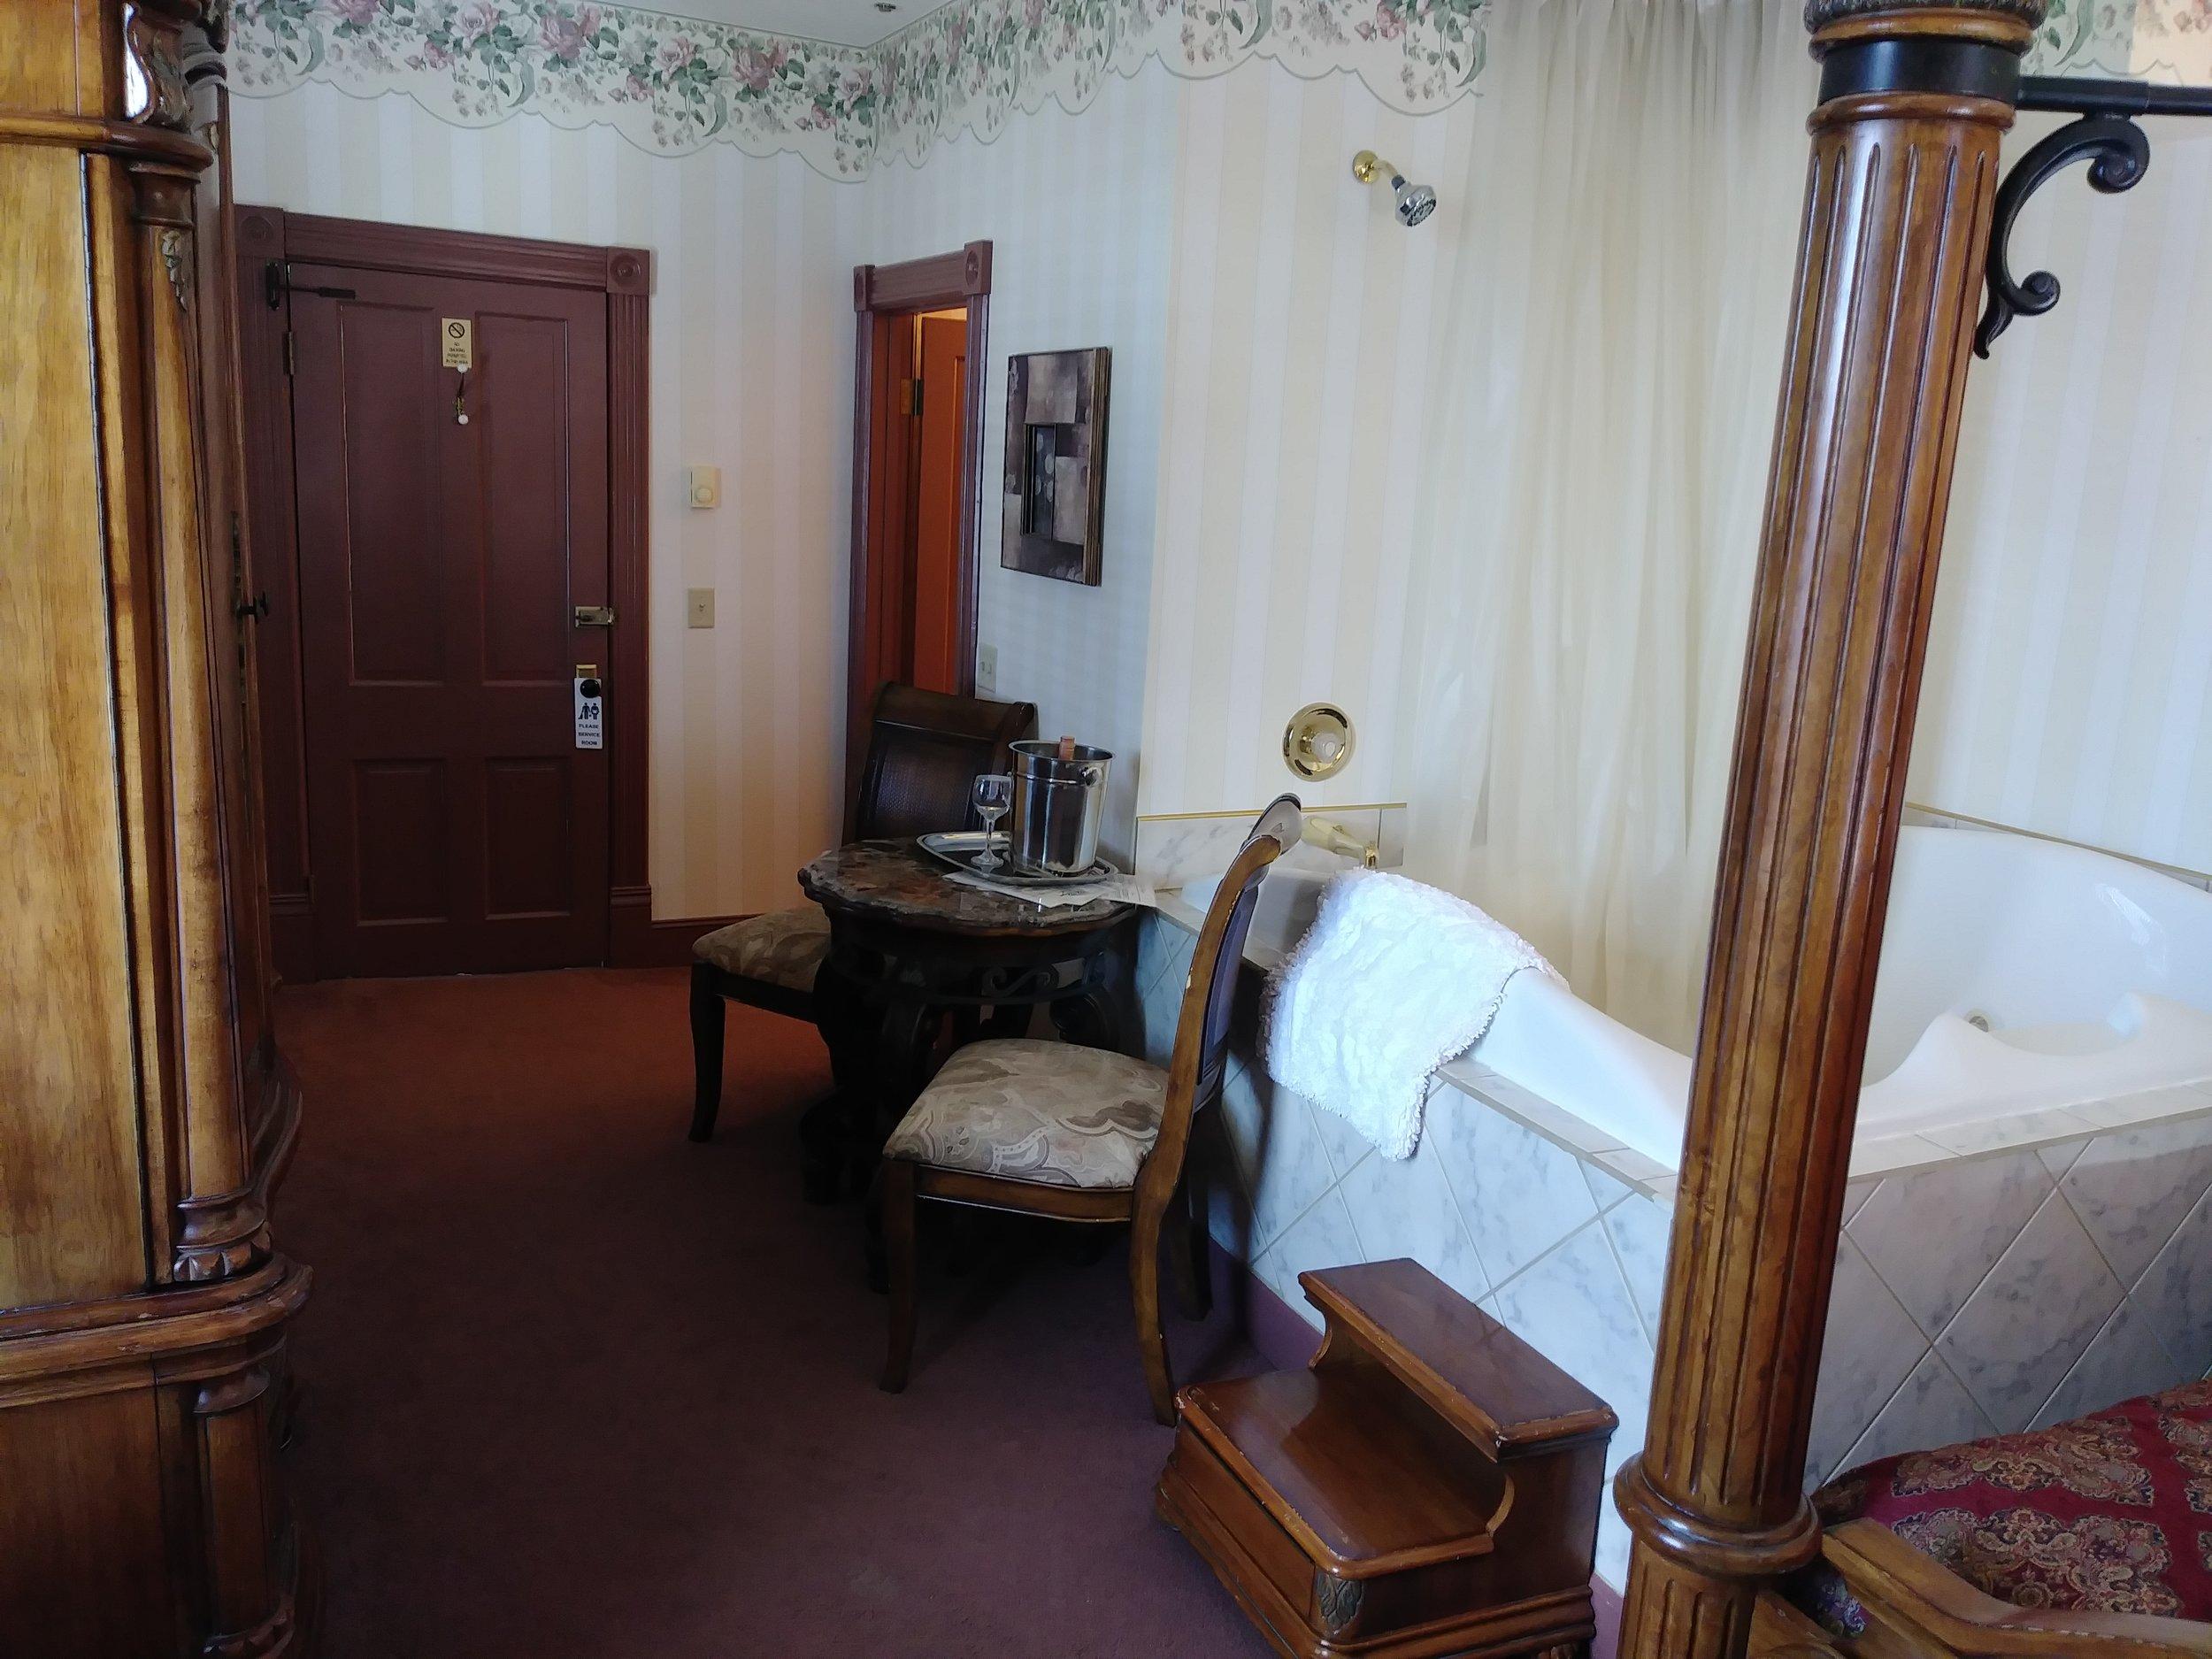 Room 204 11.jpg